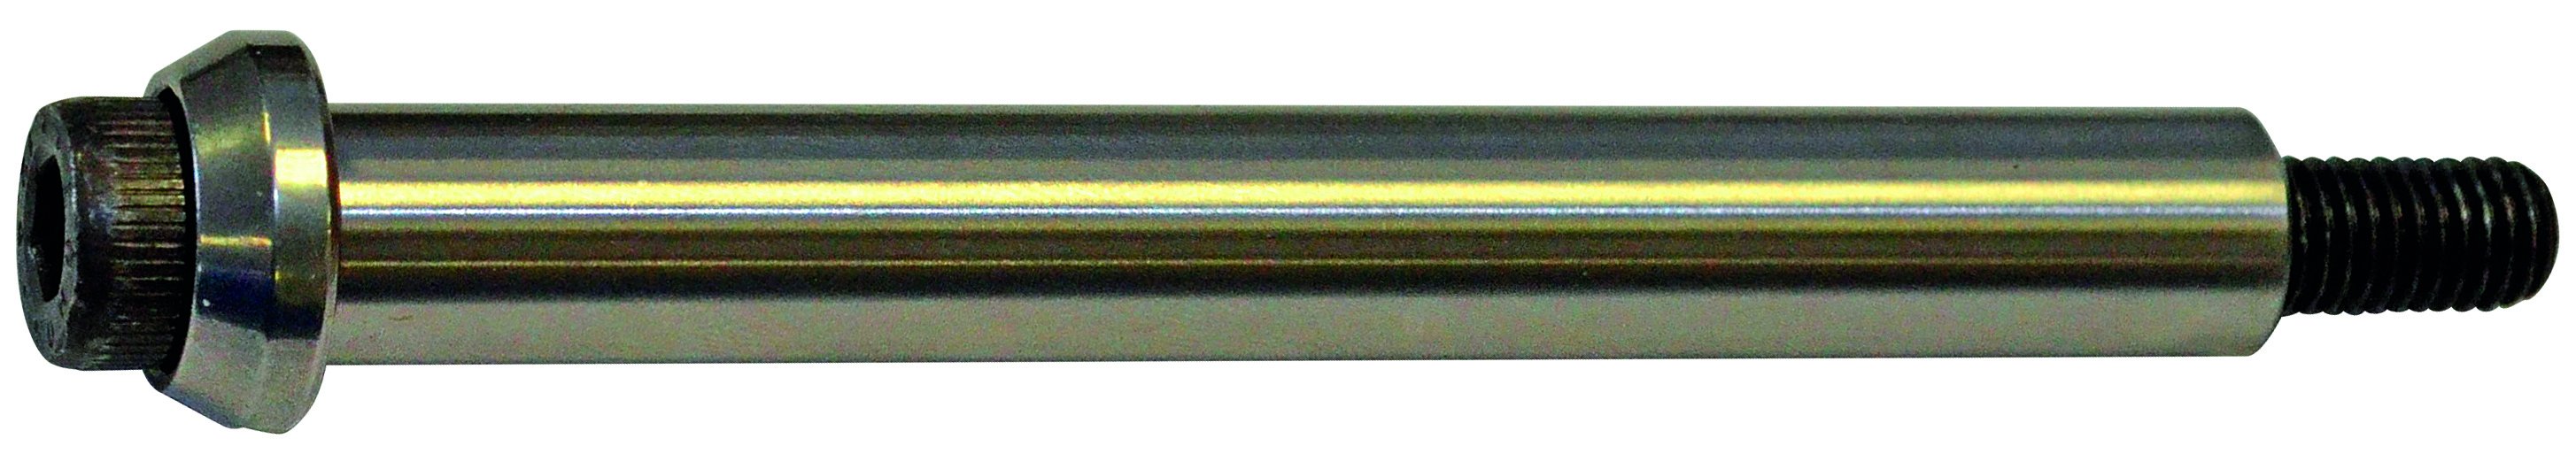 LA7380